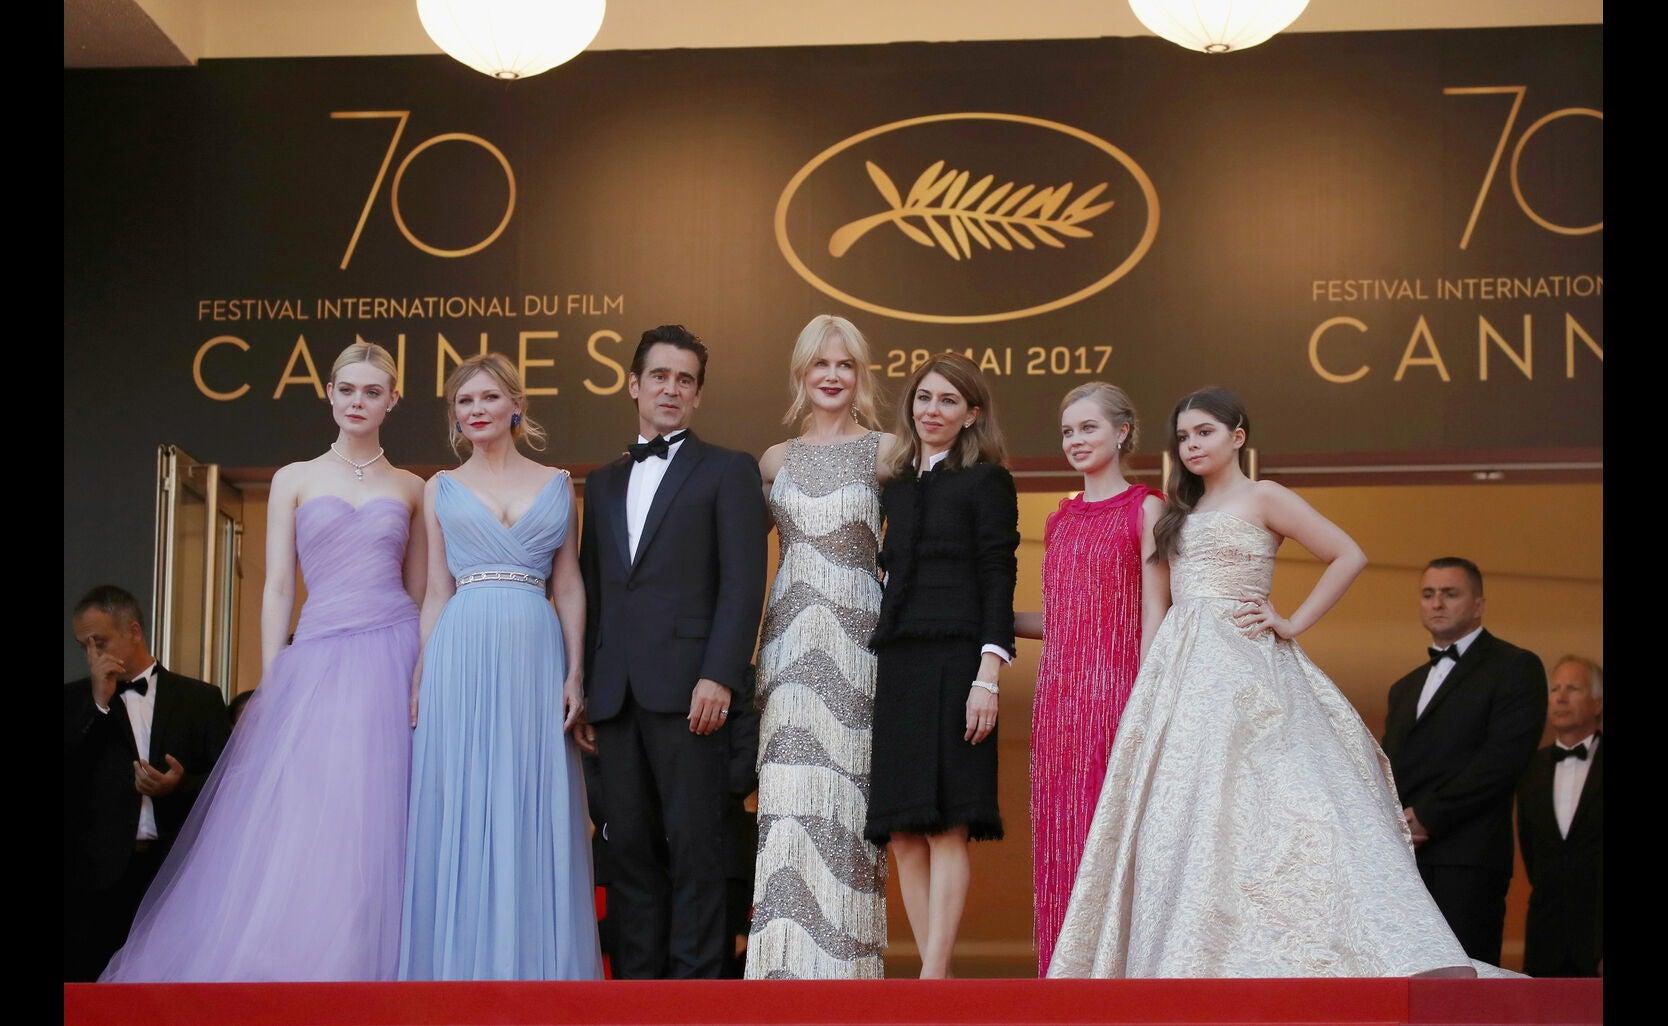 Elle Fanning, Kirsten Dunst, Colin Farrell, Nicole Kidman, director Sofia Coppola, Angousie Rice and Addison Riecke